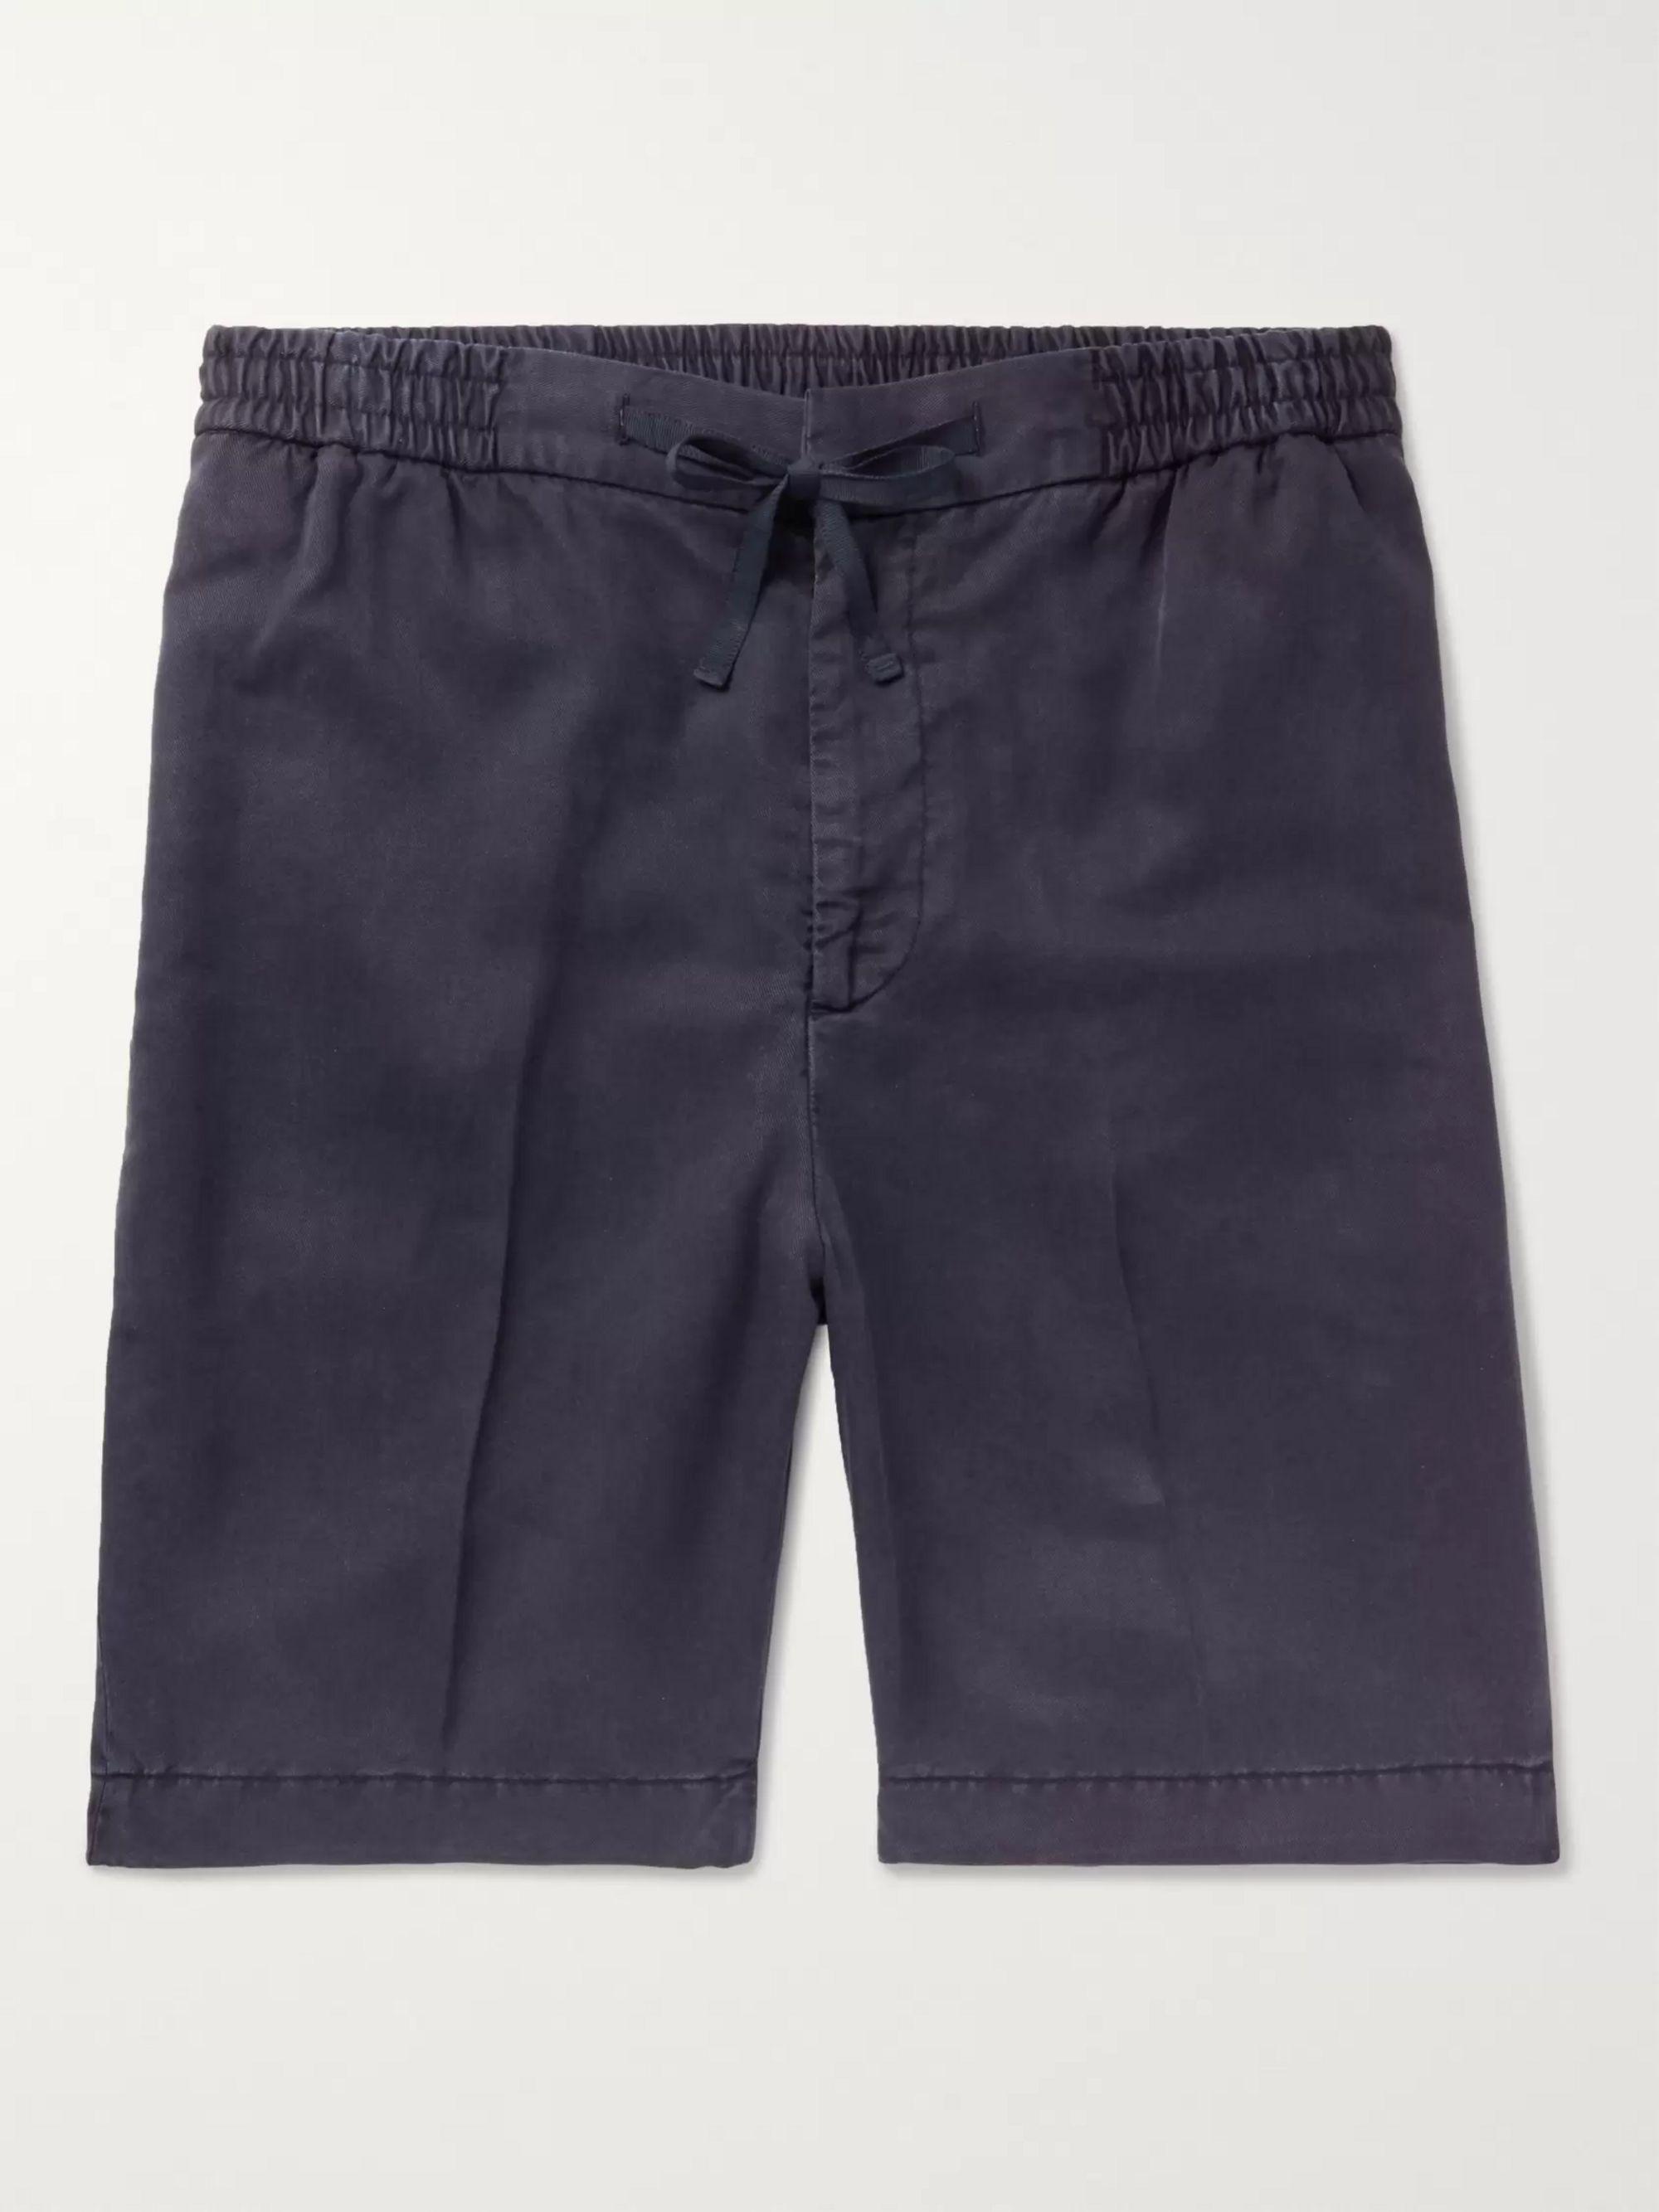 Garment Dyed Lyocell Drawstring Shorts by Mr Porter